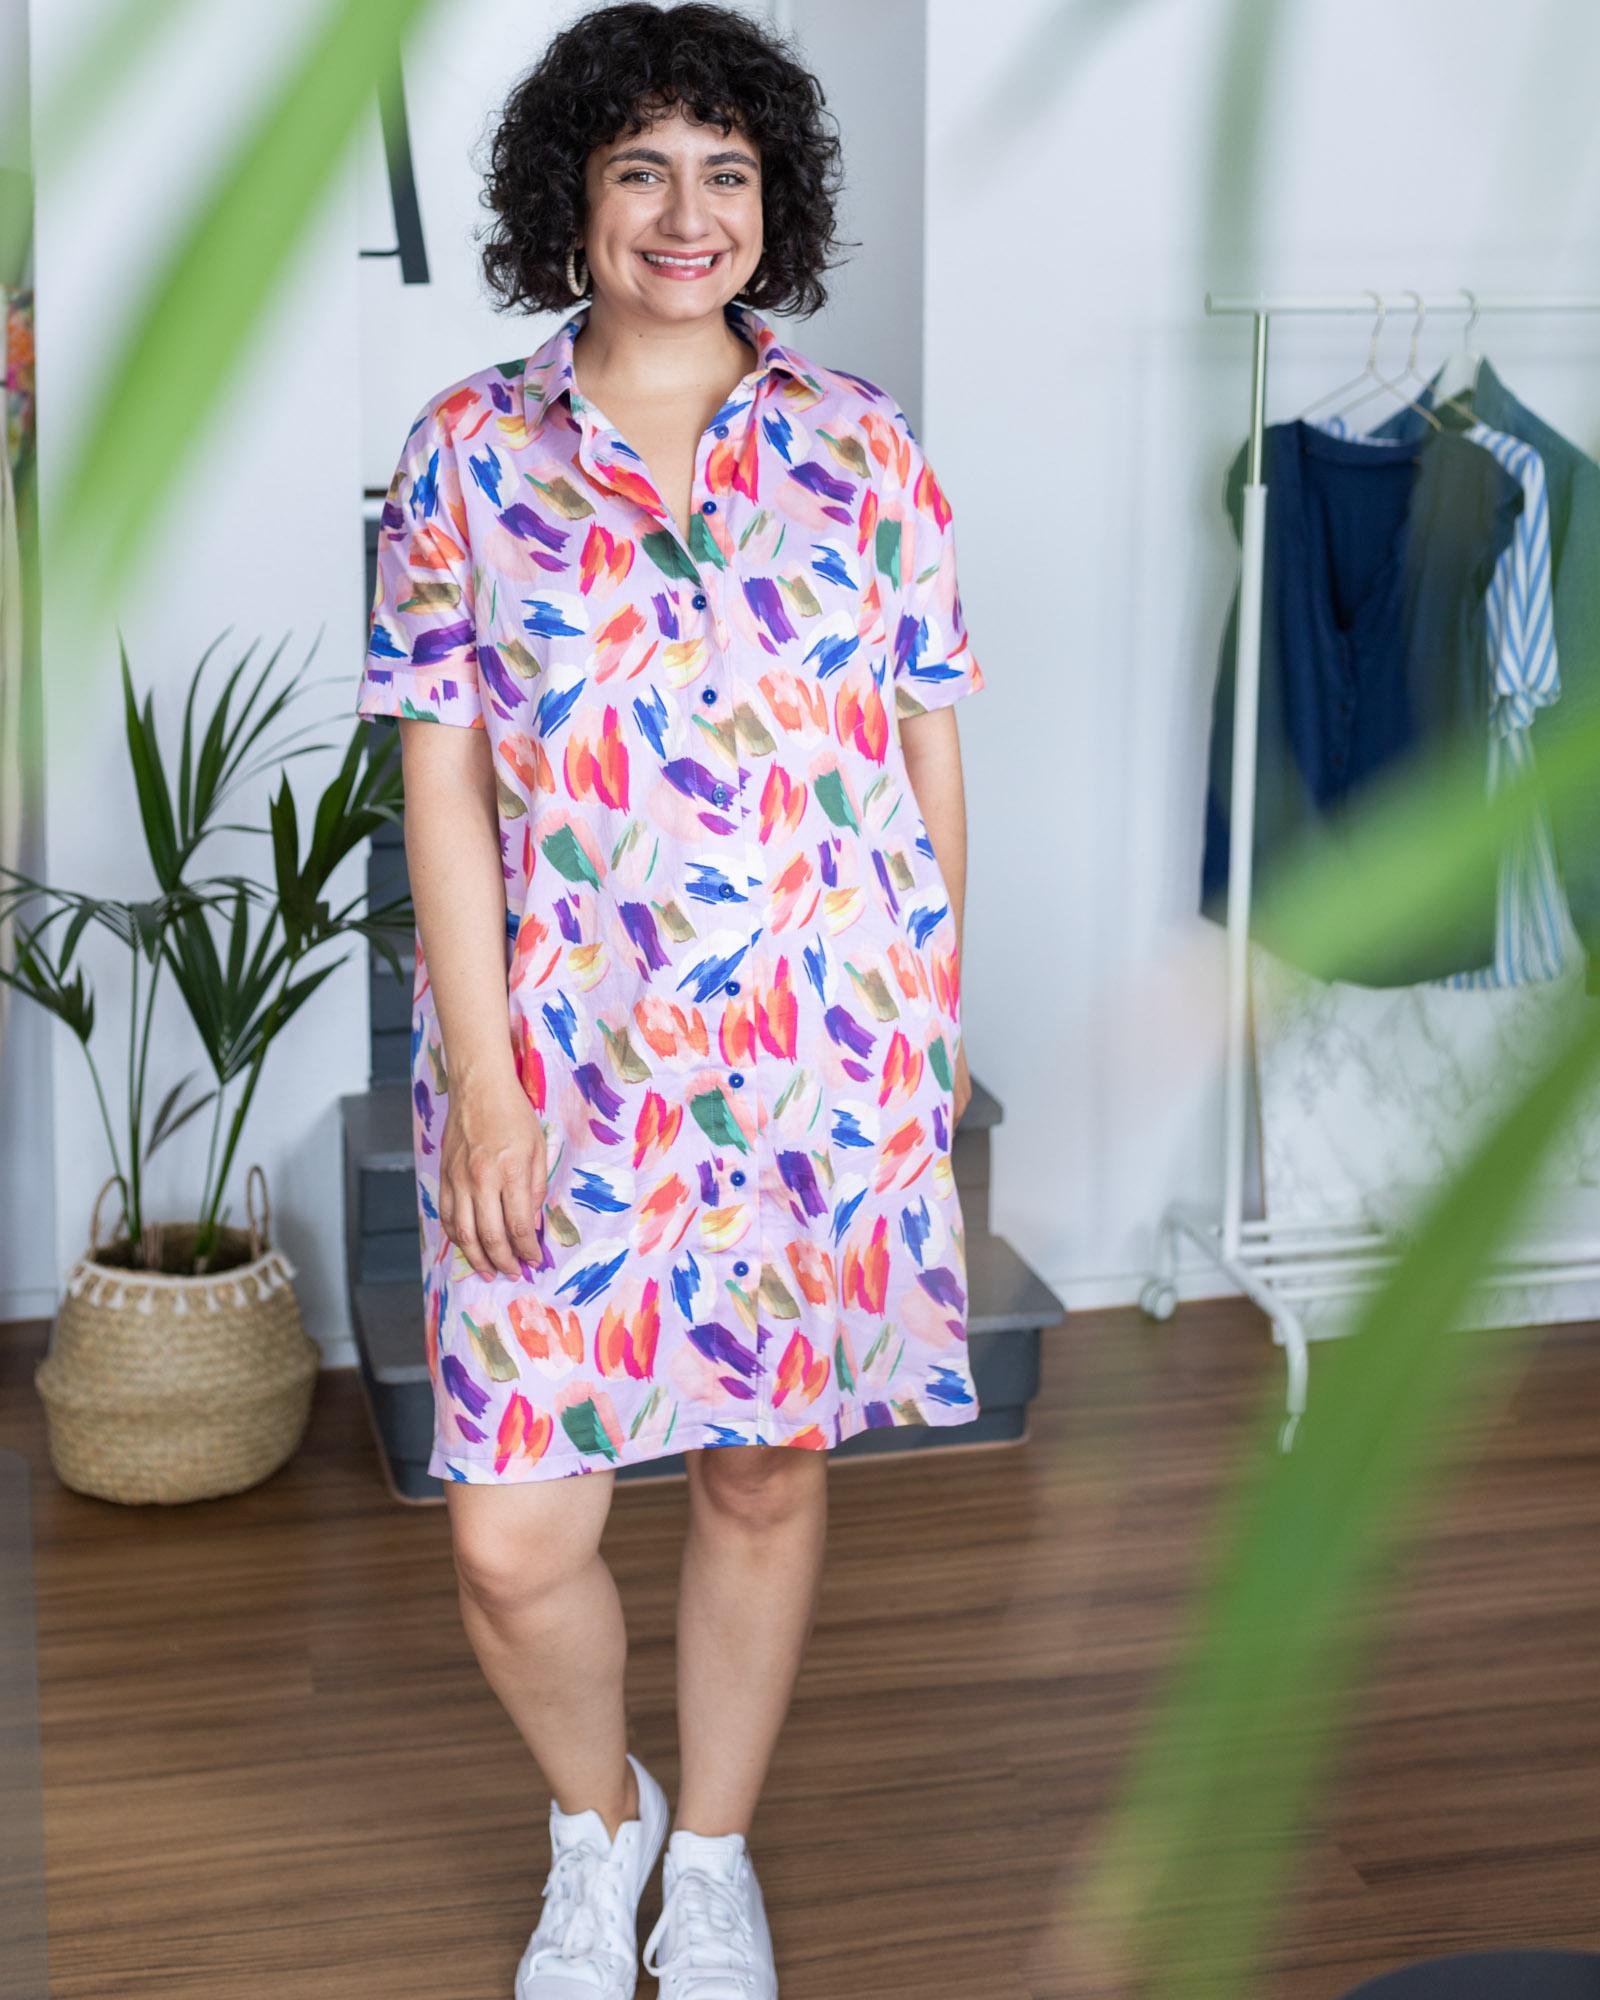 Blusenkleid nähen - Schnittmuster Blusenkleid Cocoon von Schnittduett - Katie Kortman Art Paint Splashes lilac cotton Sateen - Tweed & Greet